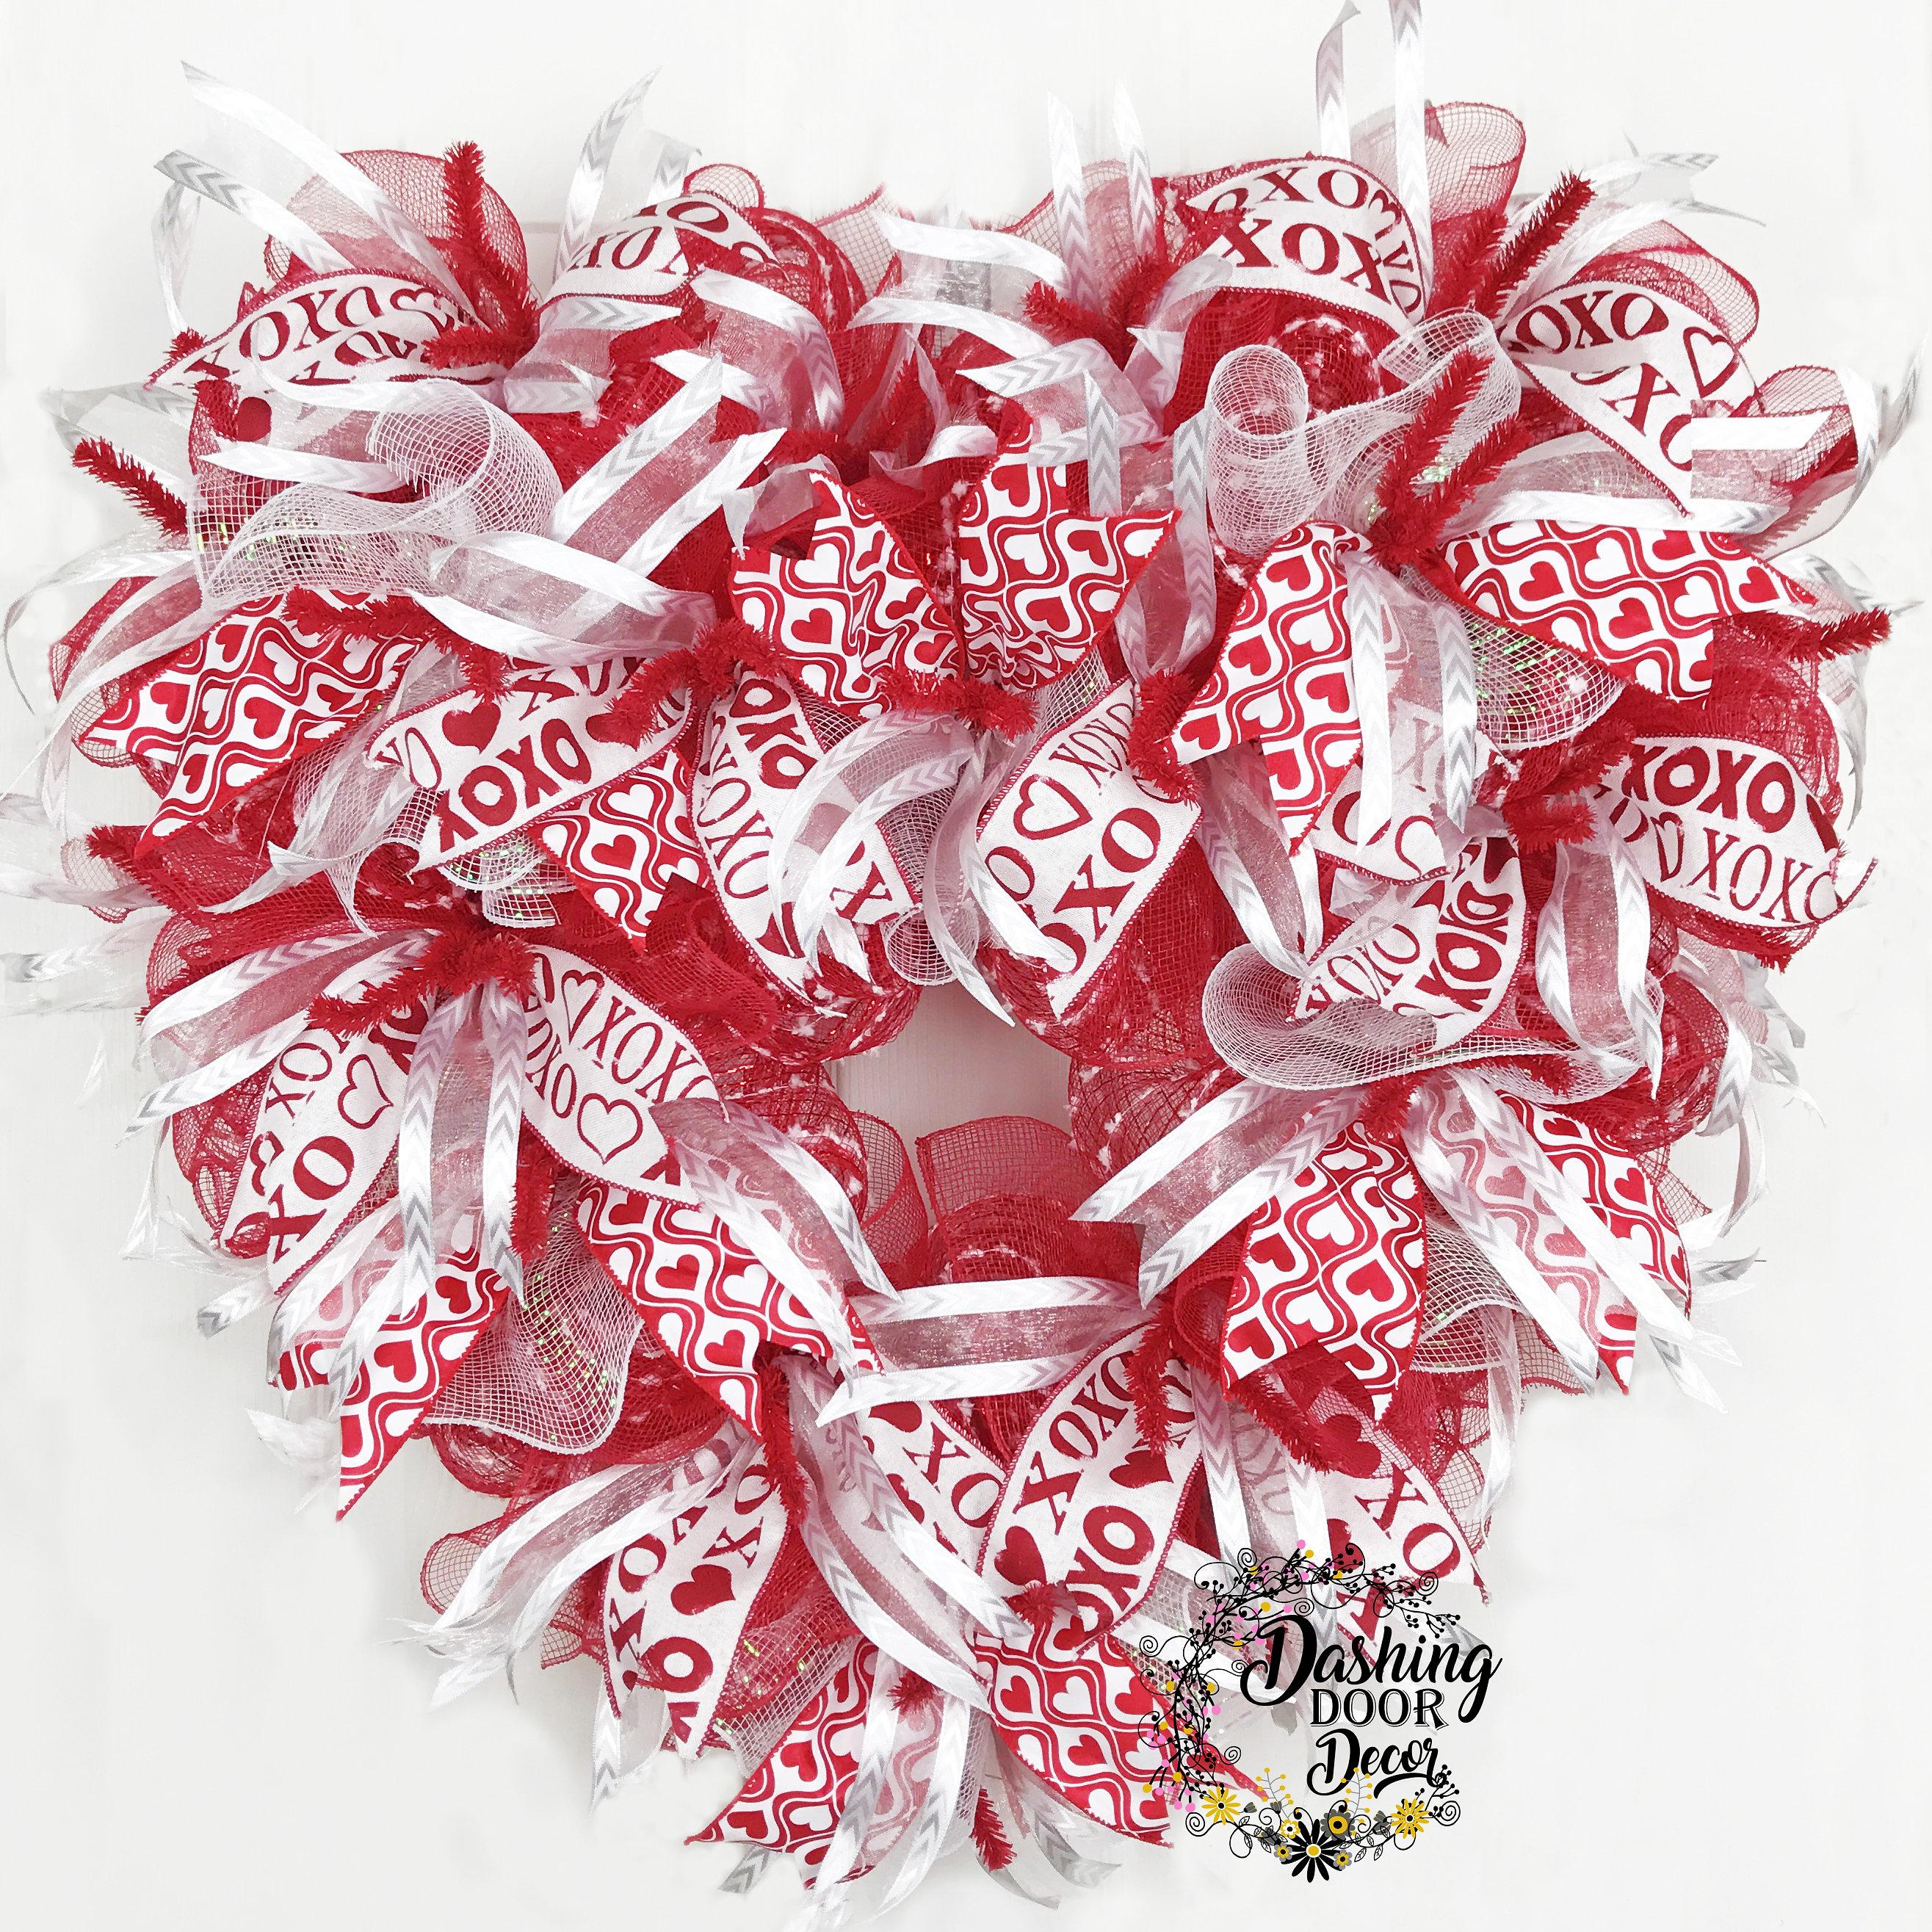 Dashingdoordecor heart shaped valentines day ruffle deco mesh heart shaped valentines day ruffle deco mesh front door red white wreath rubansaba